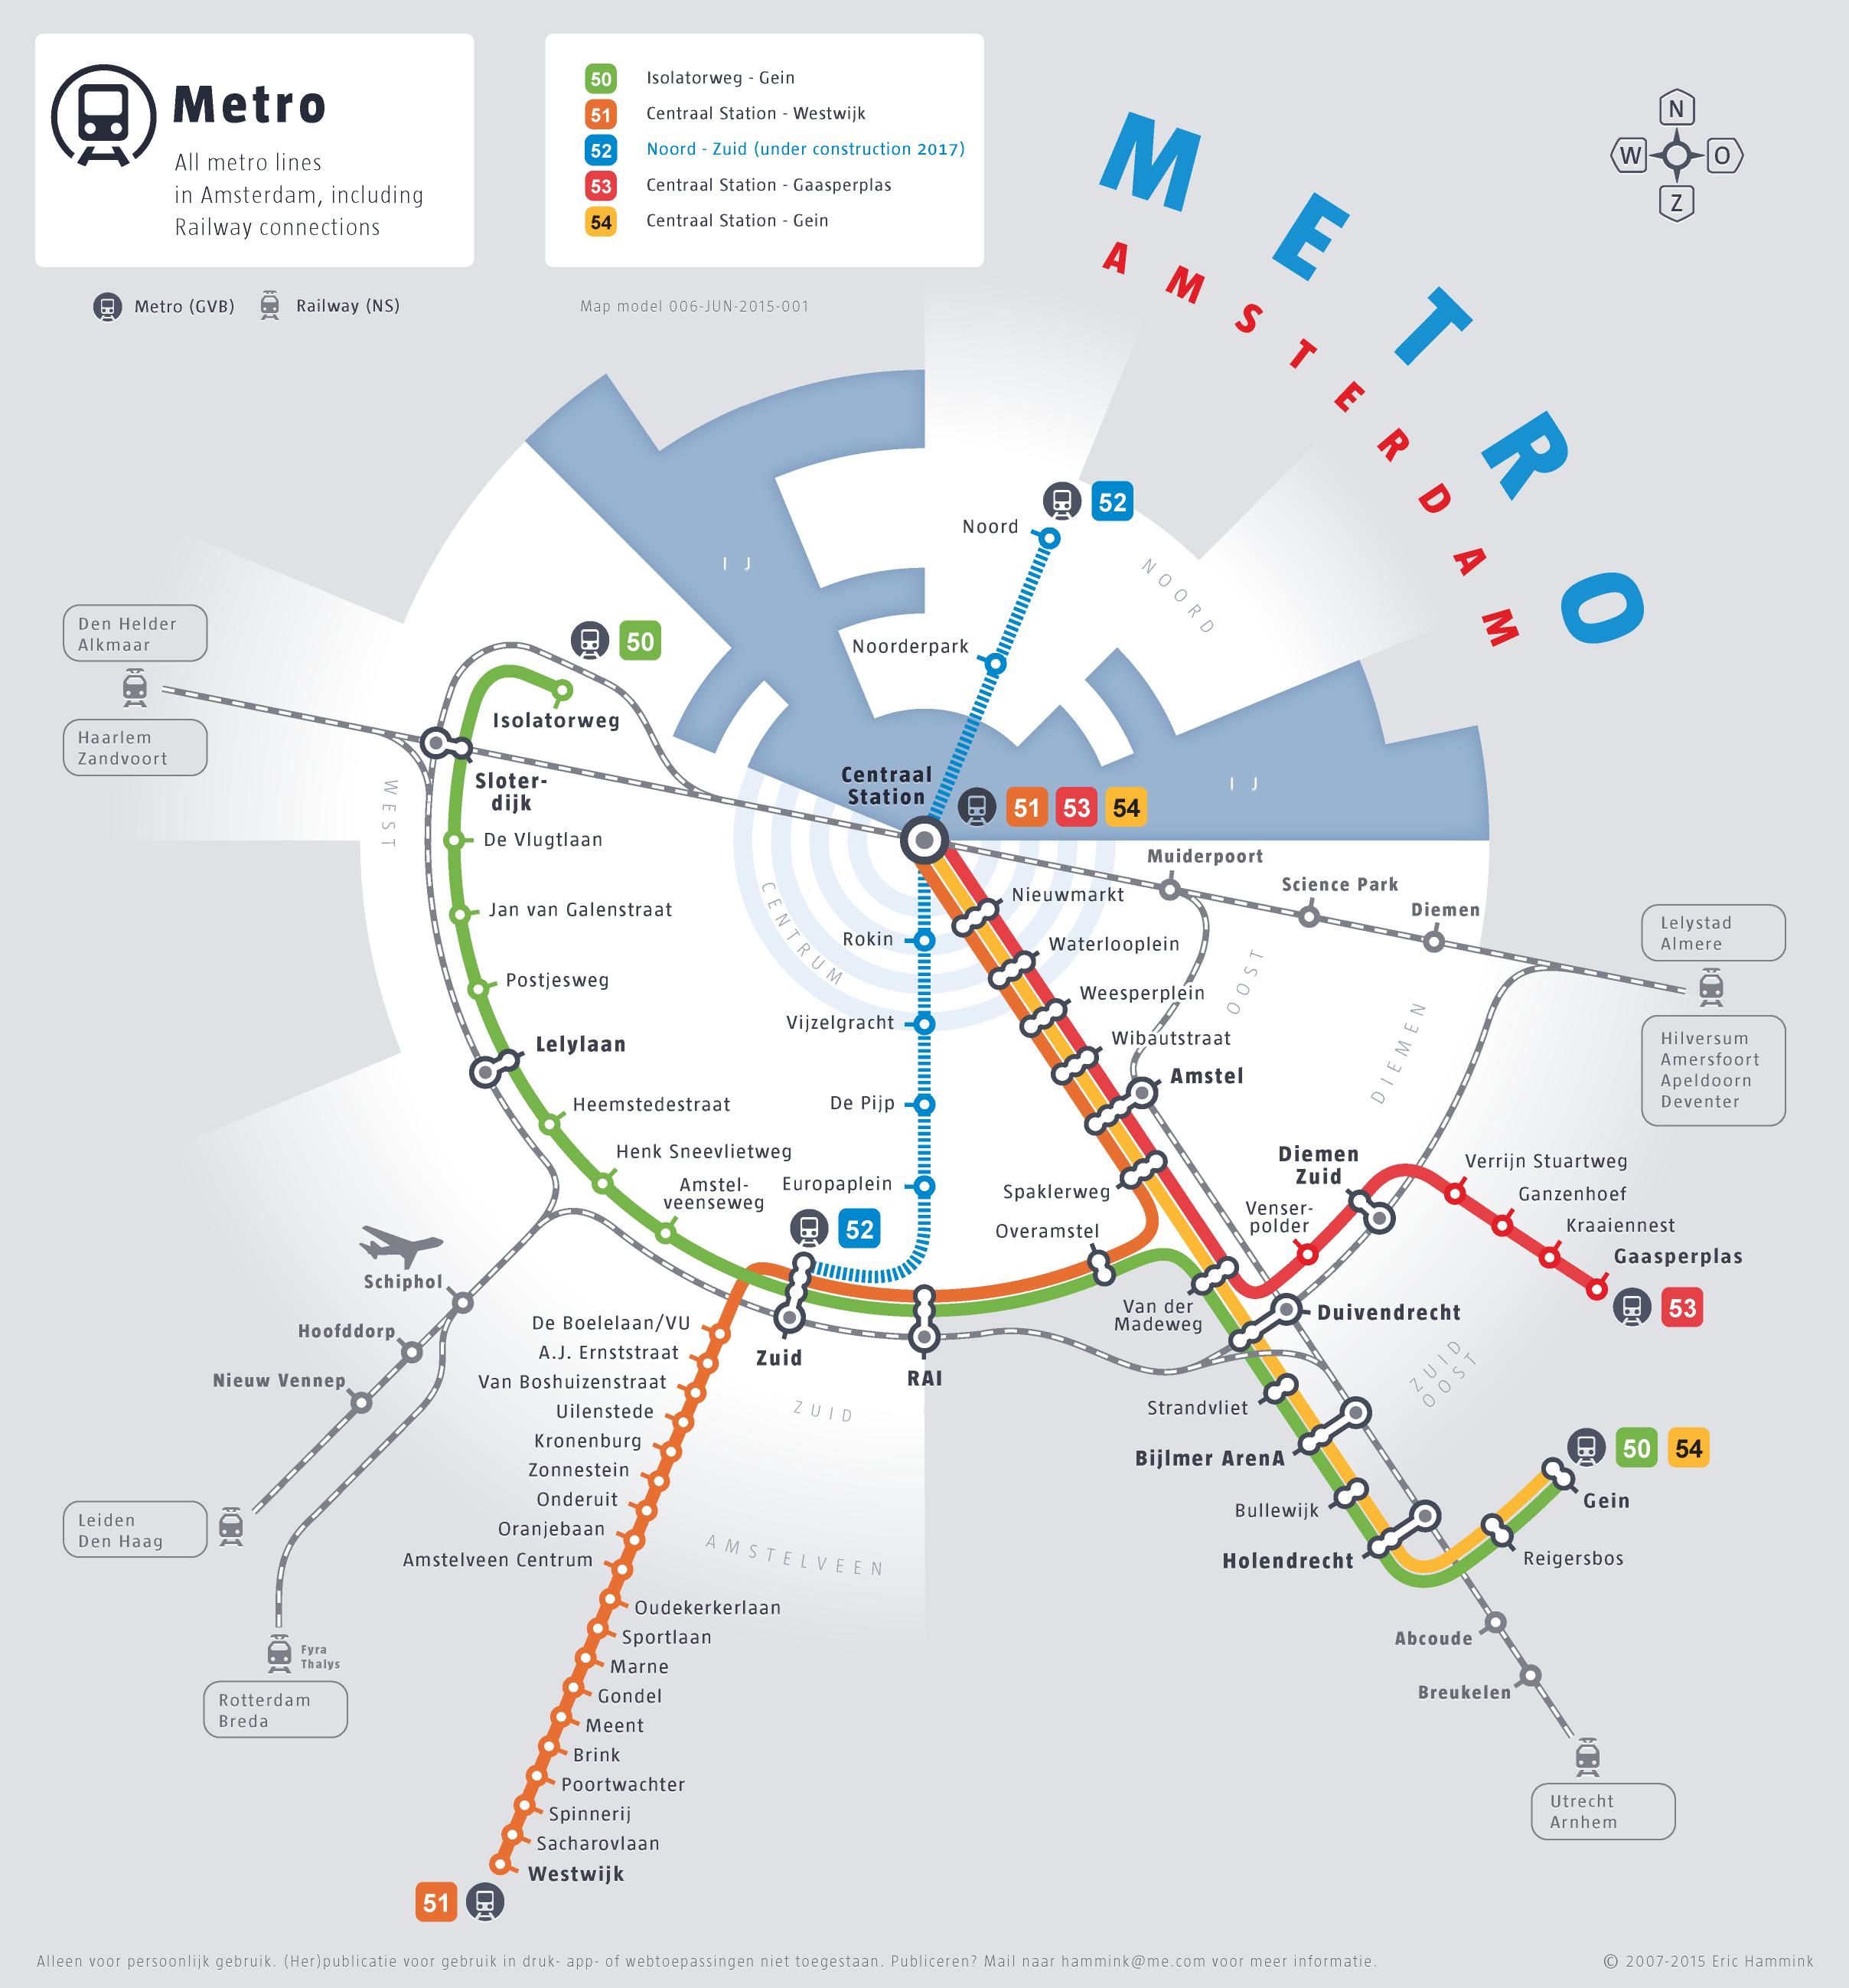 Ams Subway Map.Circulair Metro Map Of Amsterdam 2015 Edition First Edition Made